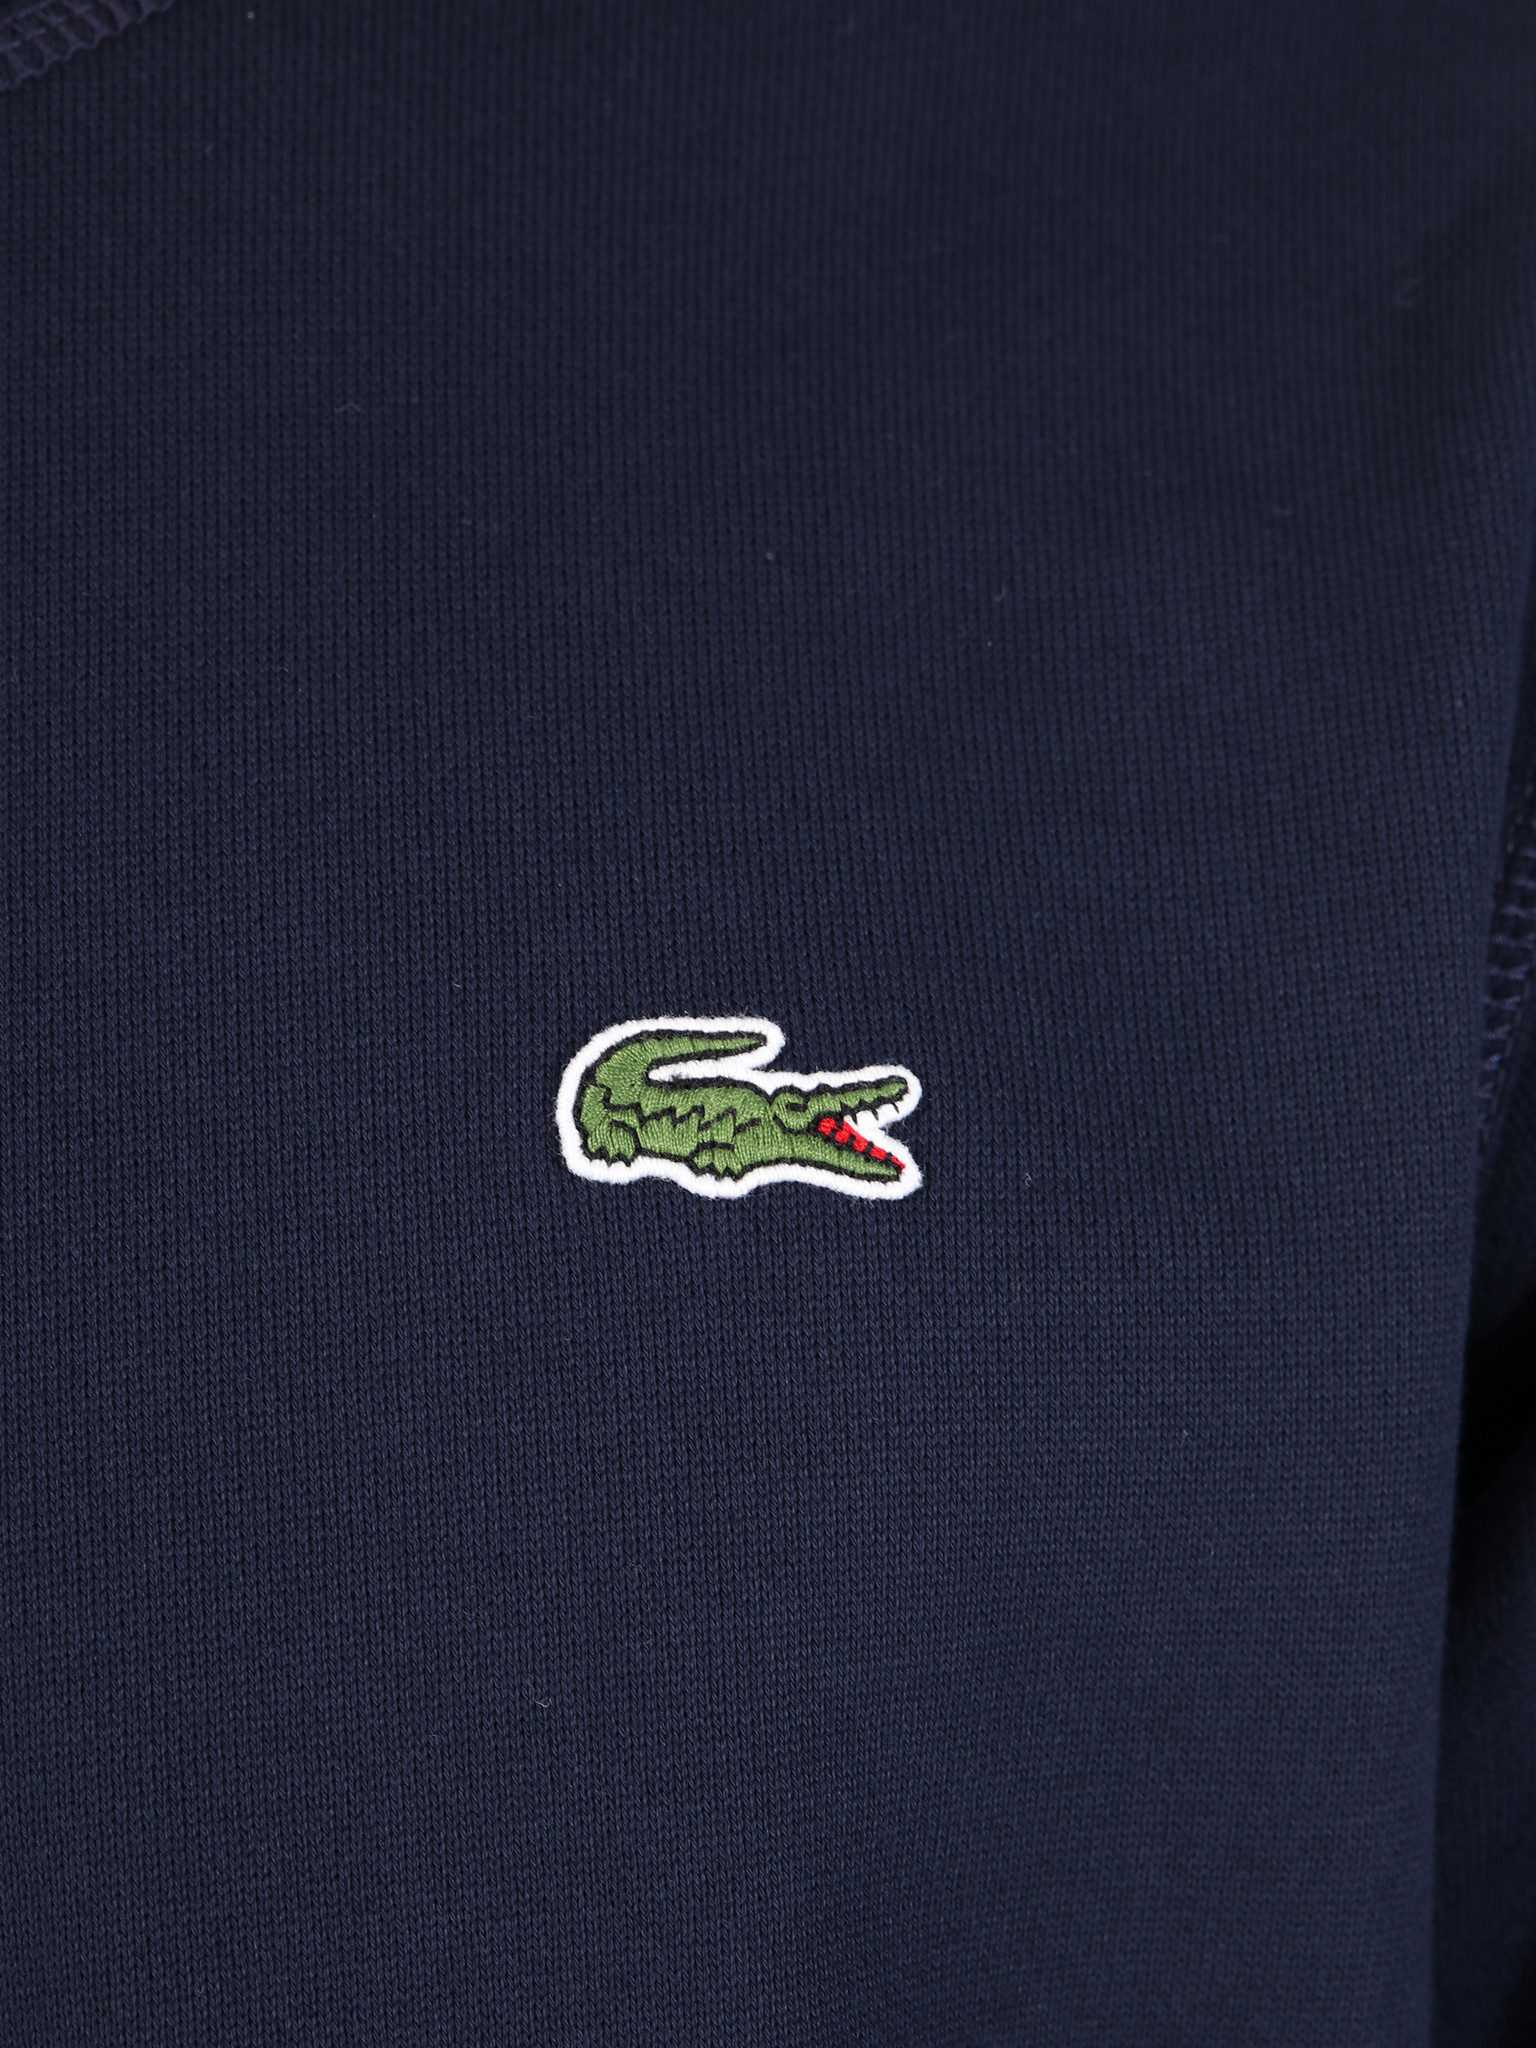 Lacoste Lacoste 1HS1 Sweatshirt 08A Marine Marine-Marine-Mari Sh9075-83